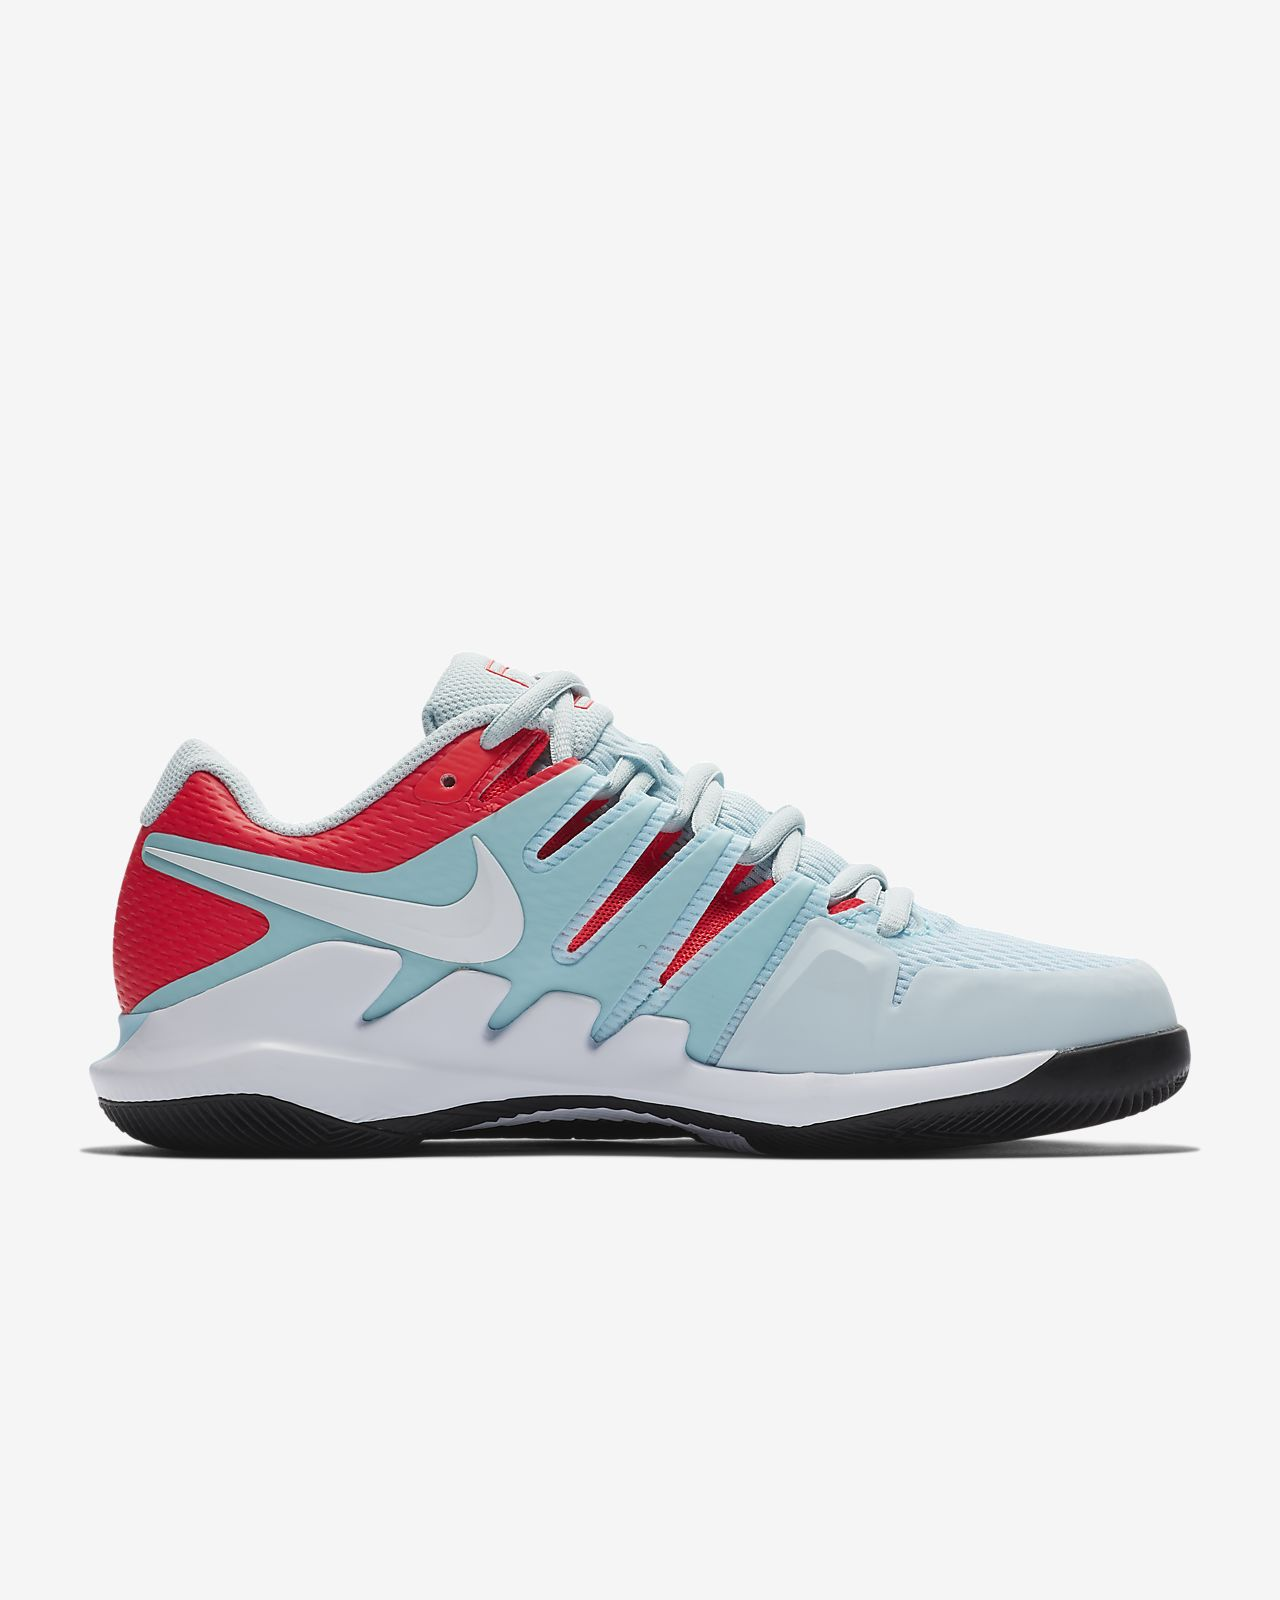 6f3e431302dd NikeCourt Air Zoom Vapor X Women s Hard Court Tennis Shoe. Nike.com AU